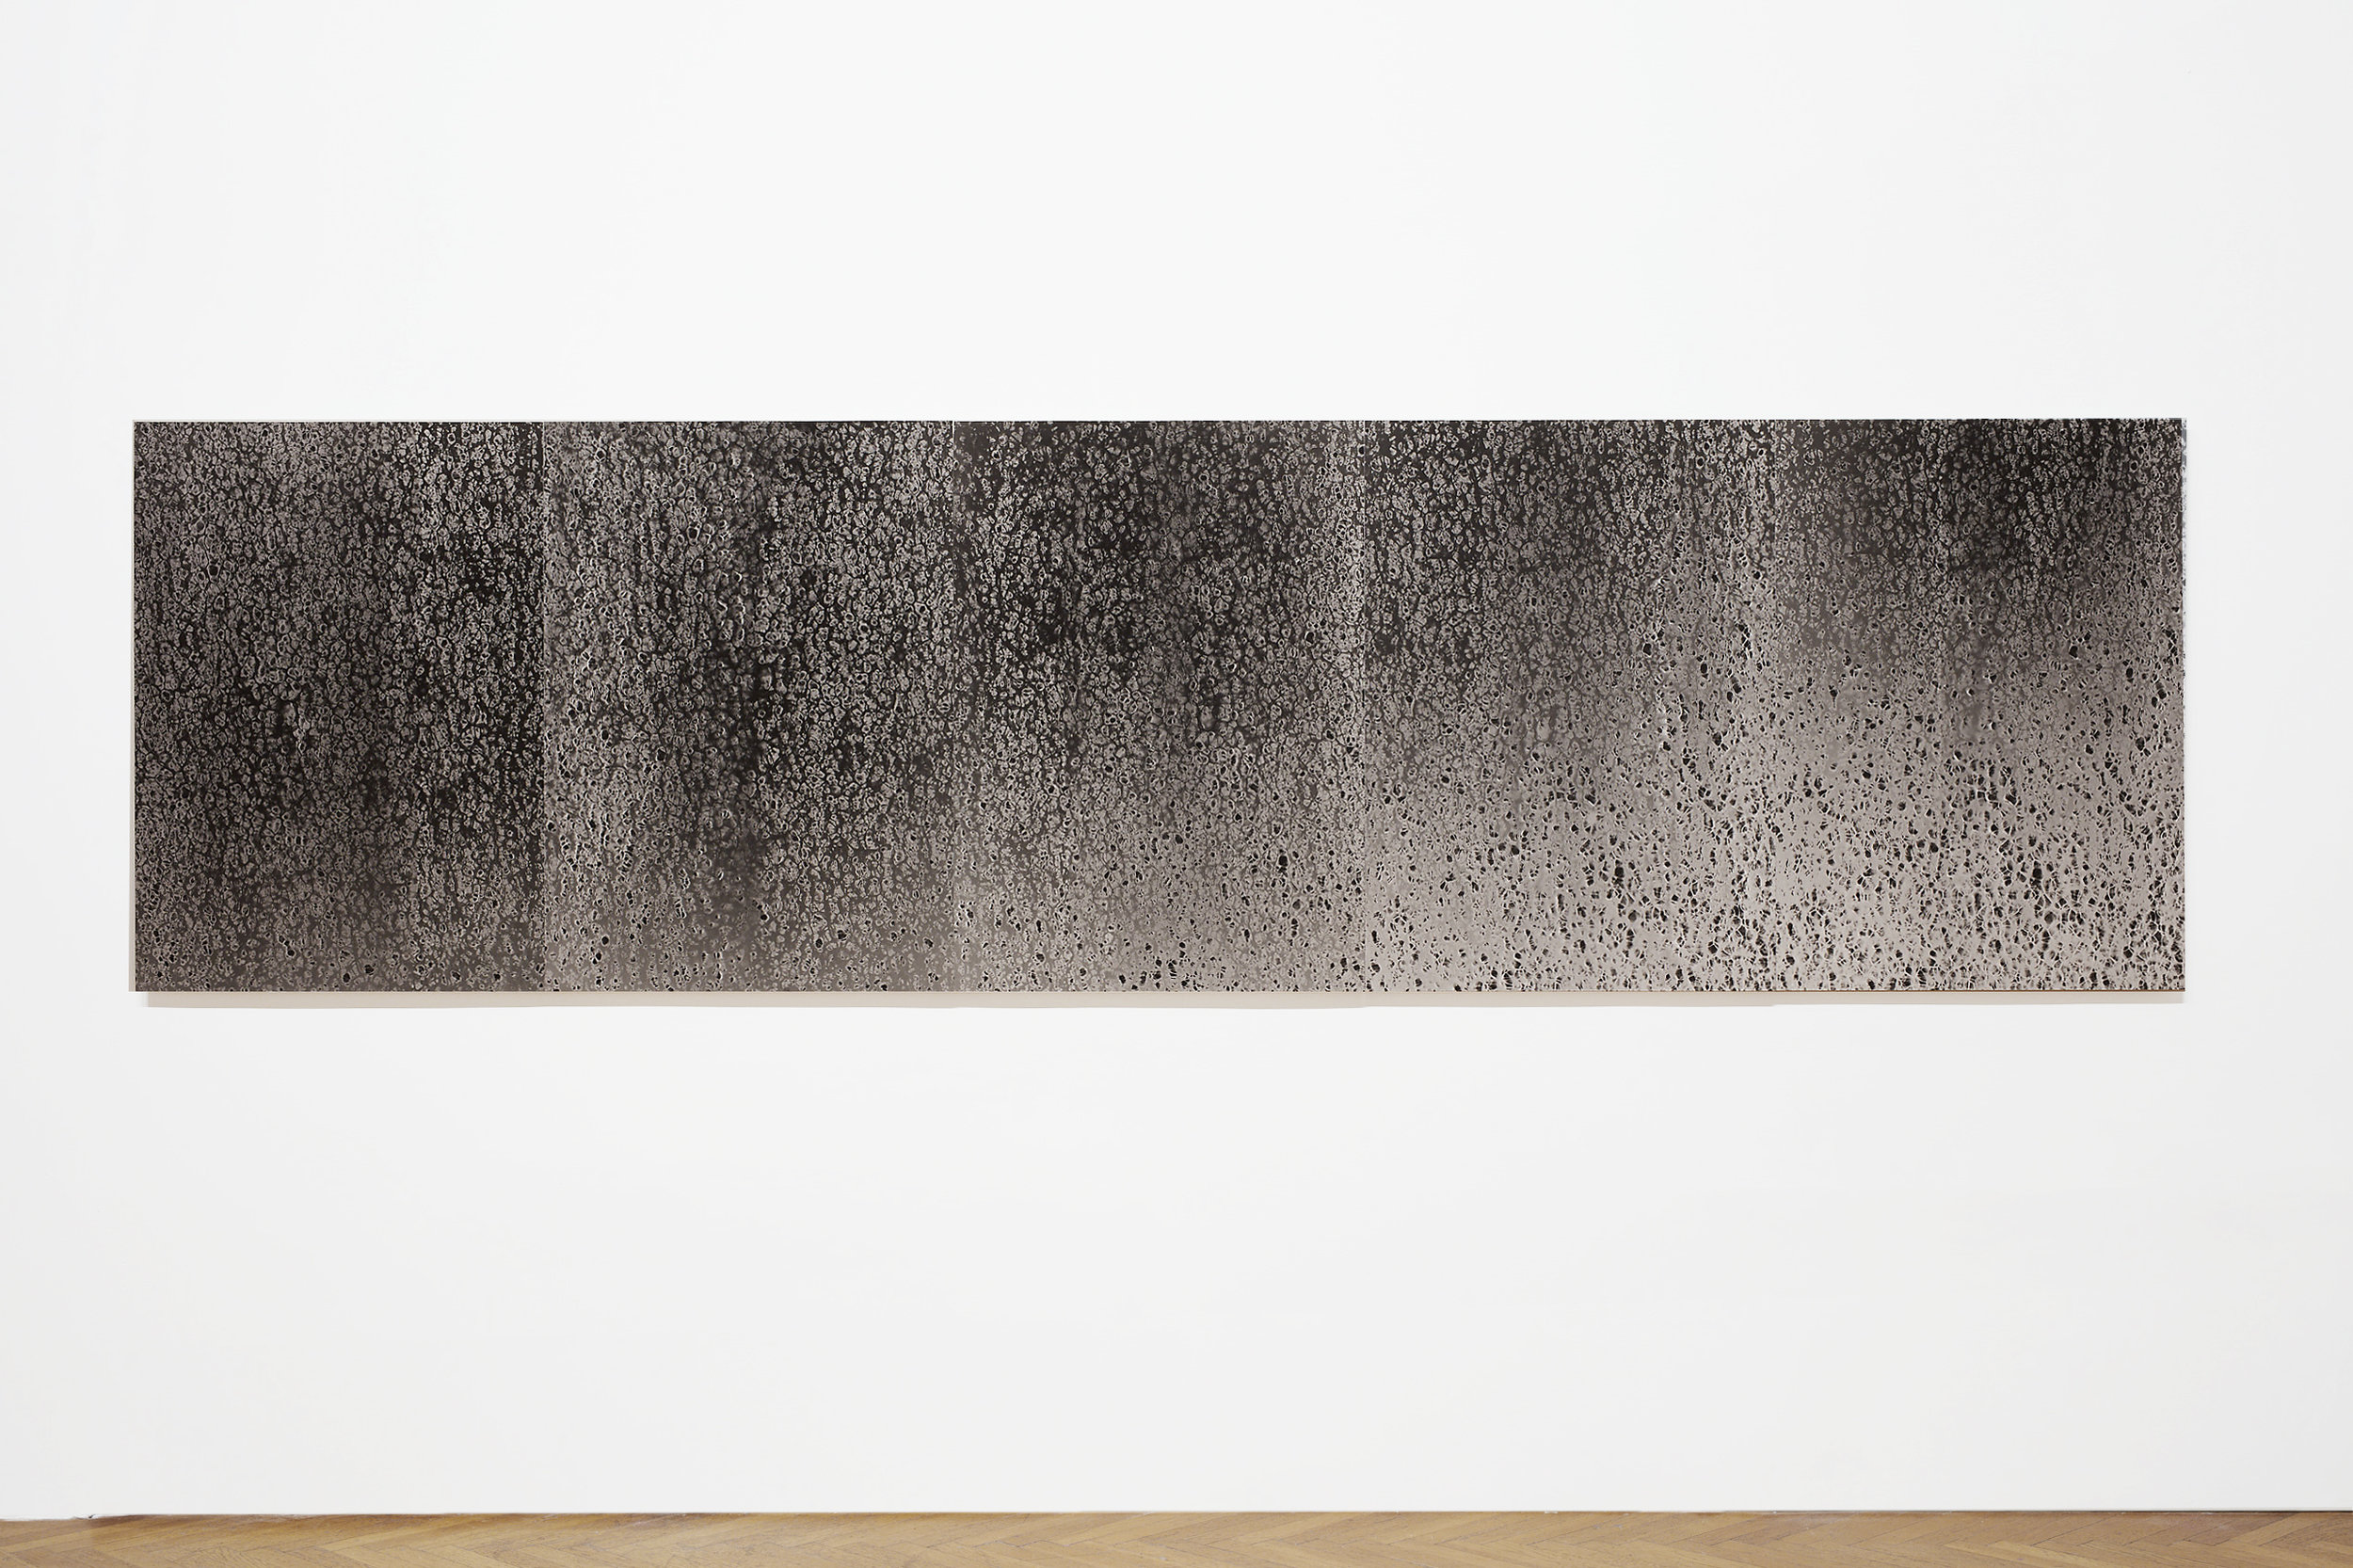 Installation, Mills College Art Museum 2018